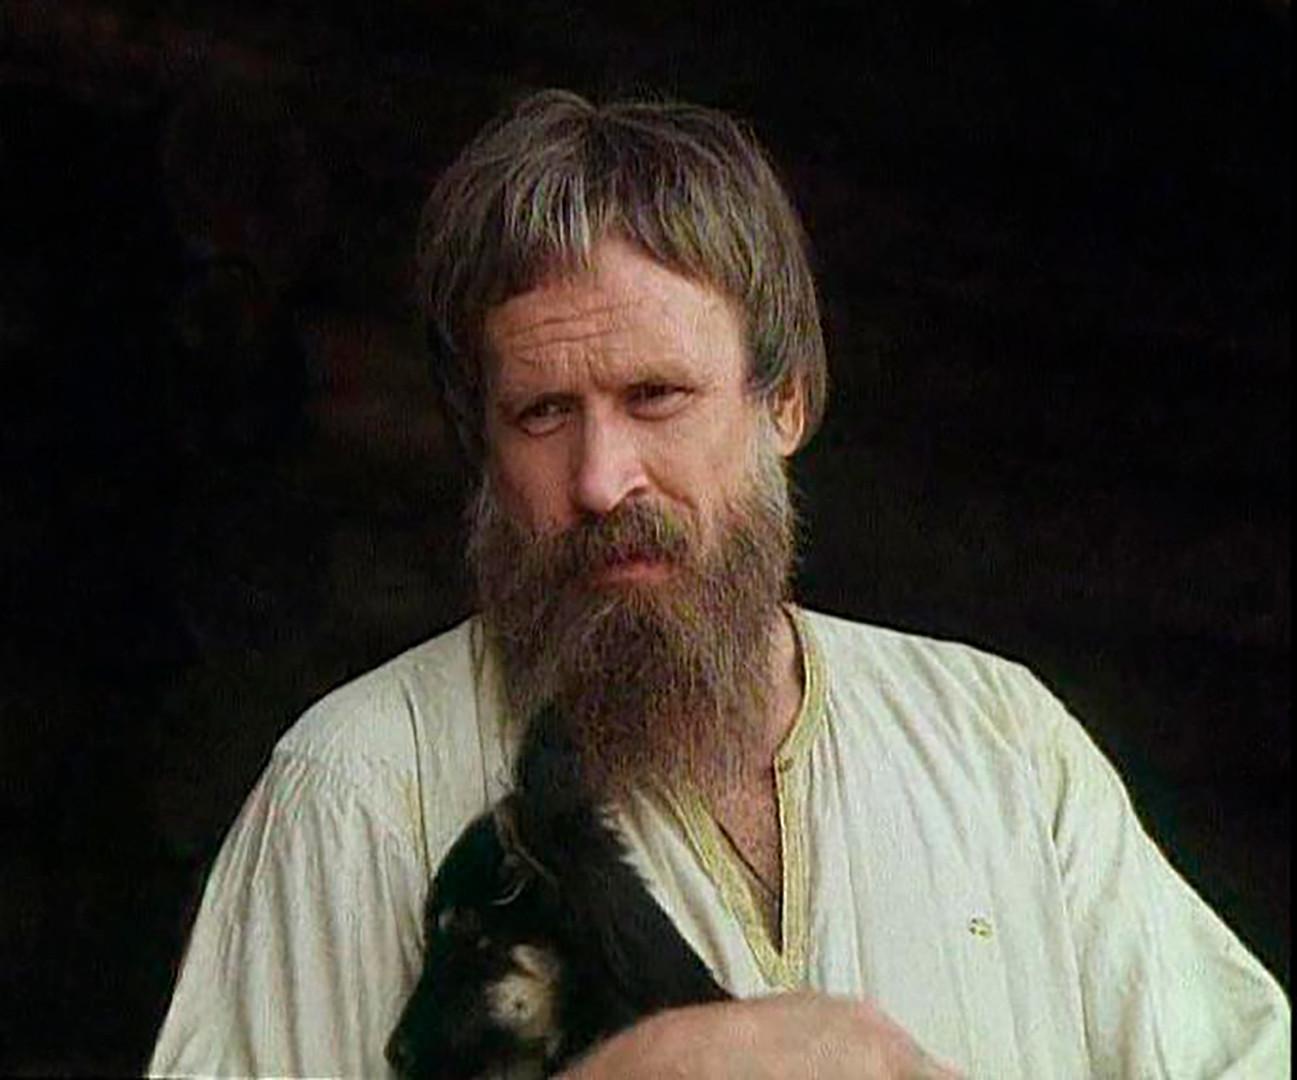 Bojar Kučka. Prizor iz filma Jurij Dolgoruki (1998)